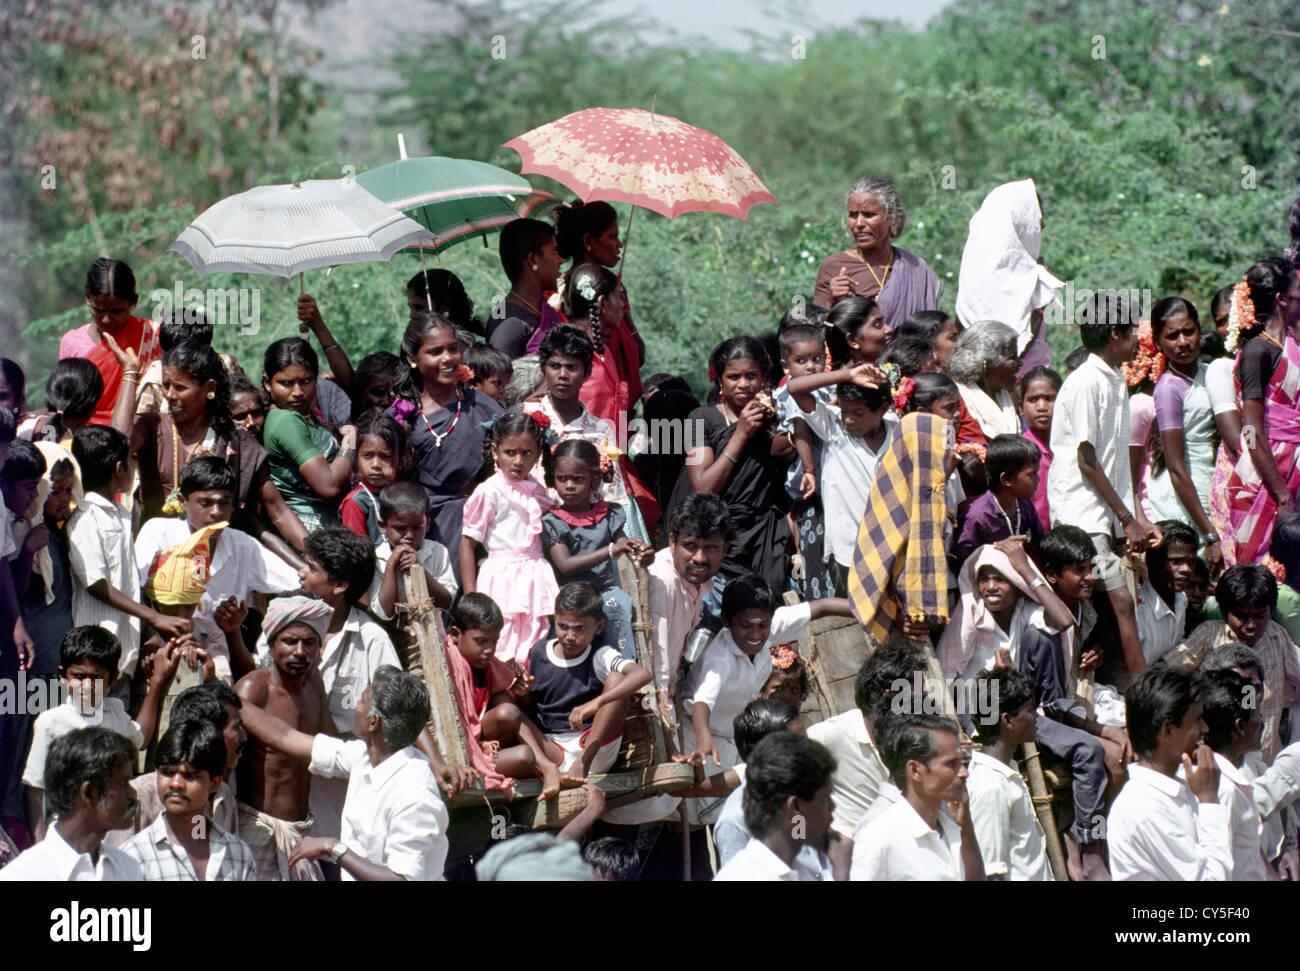 carts serves as a gallery for the keen audience of Jallikattu at urangampatti near madurai,tamilnadu,india - Stock Image